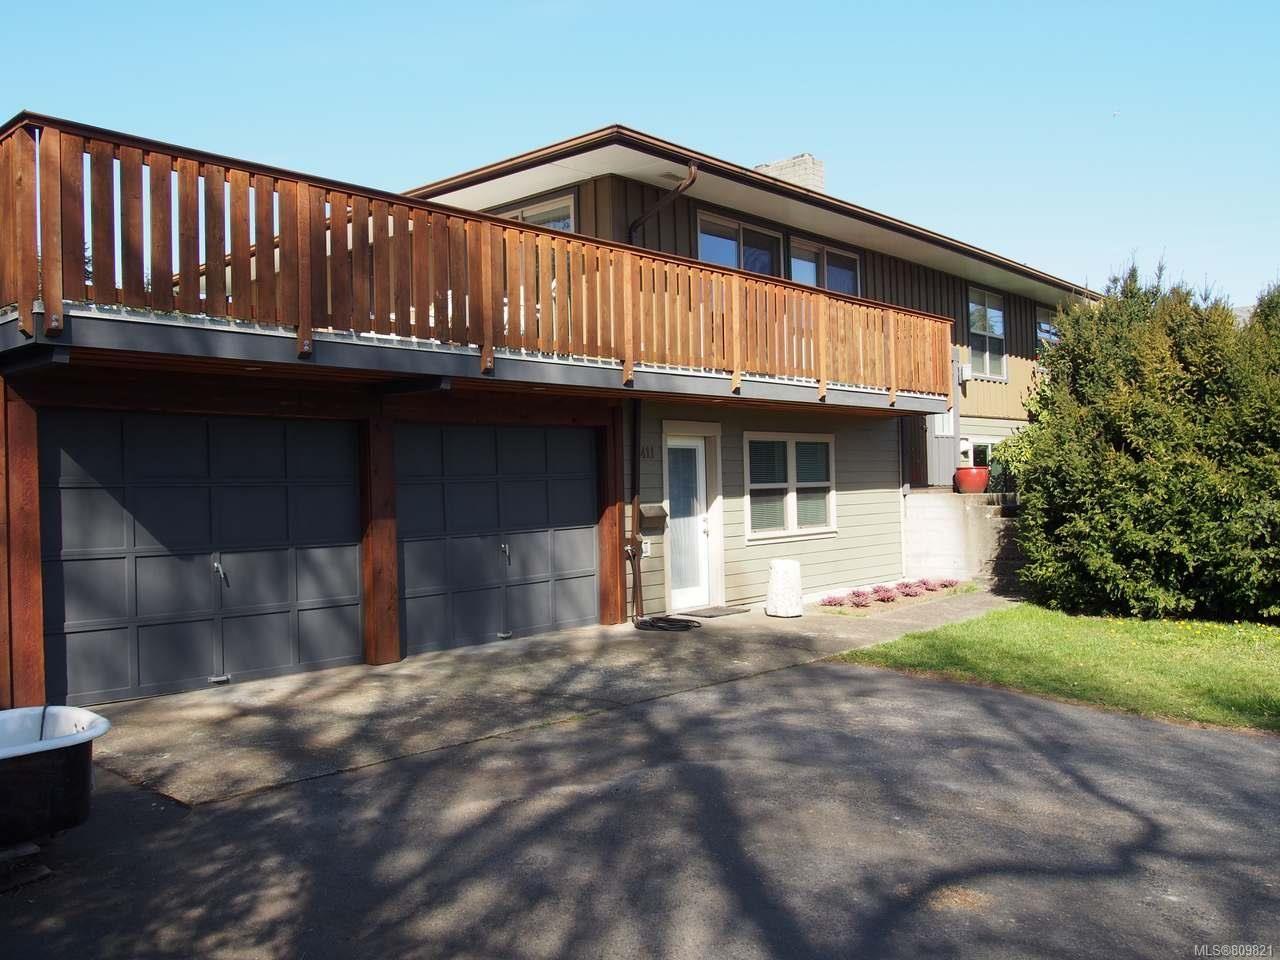 Main Photo: 2411 Glenayr Dr in NANAIMO: Na Departure Bay House for sale (Nanaimo)  : MLS®# 809821